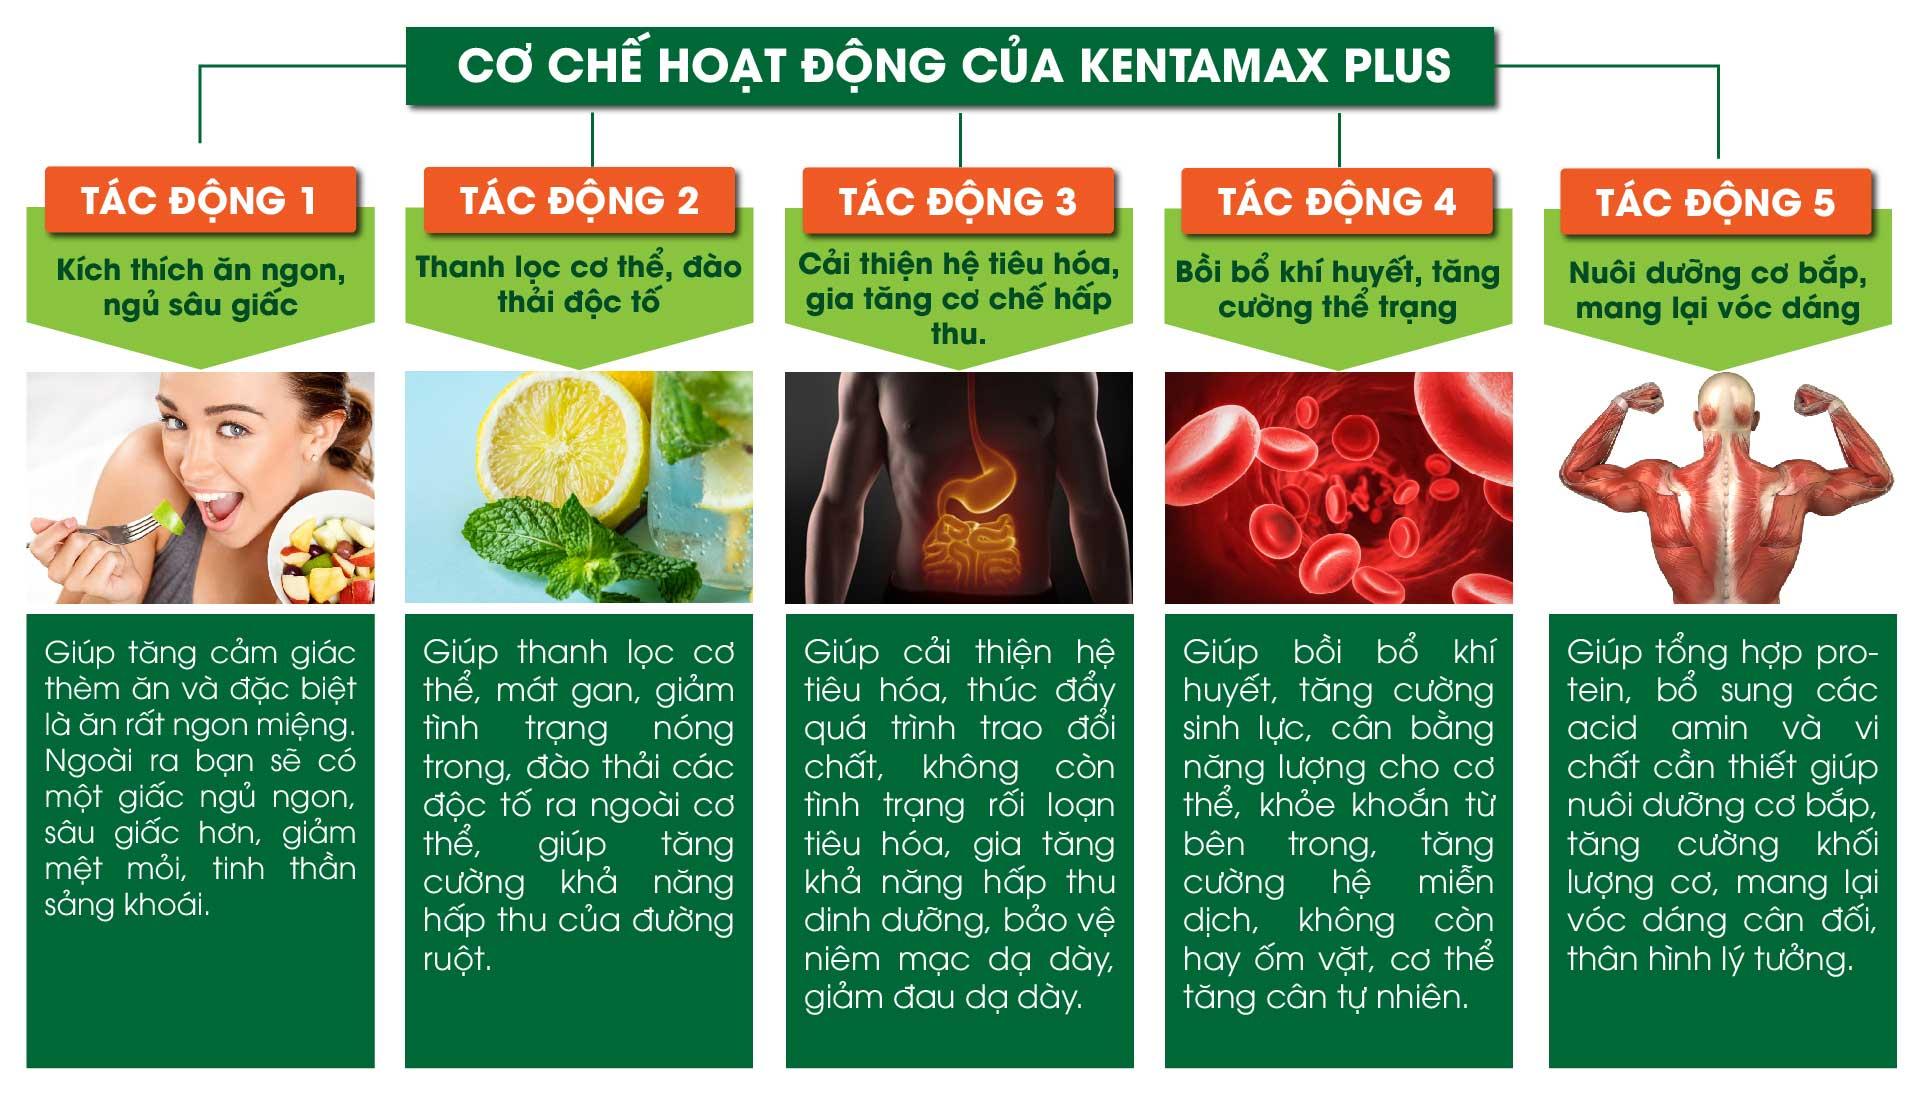 co-che-tac-dong-vien-uong-kentamax-plus